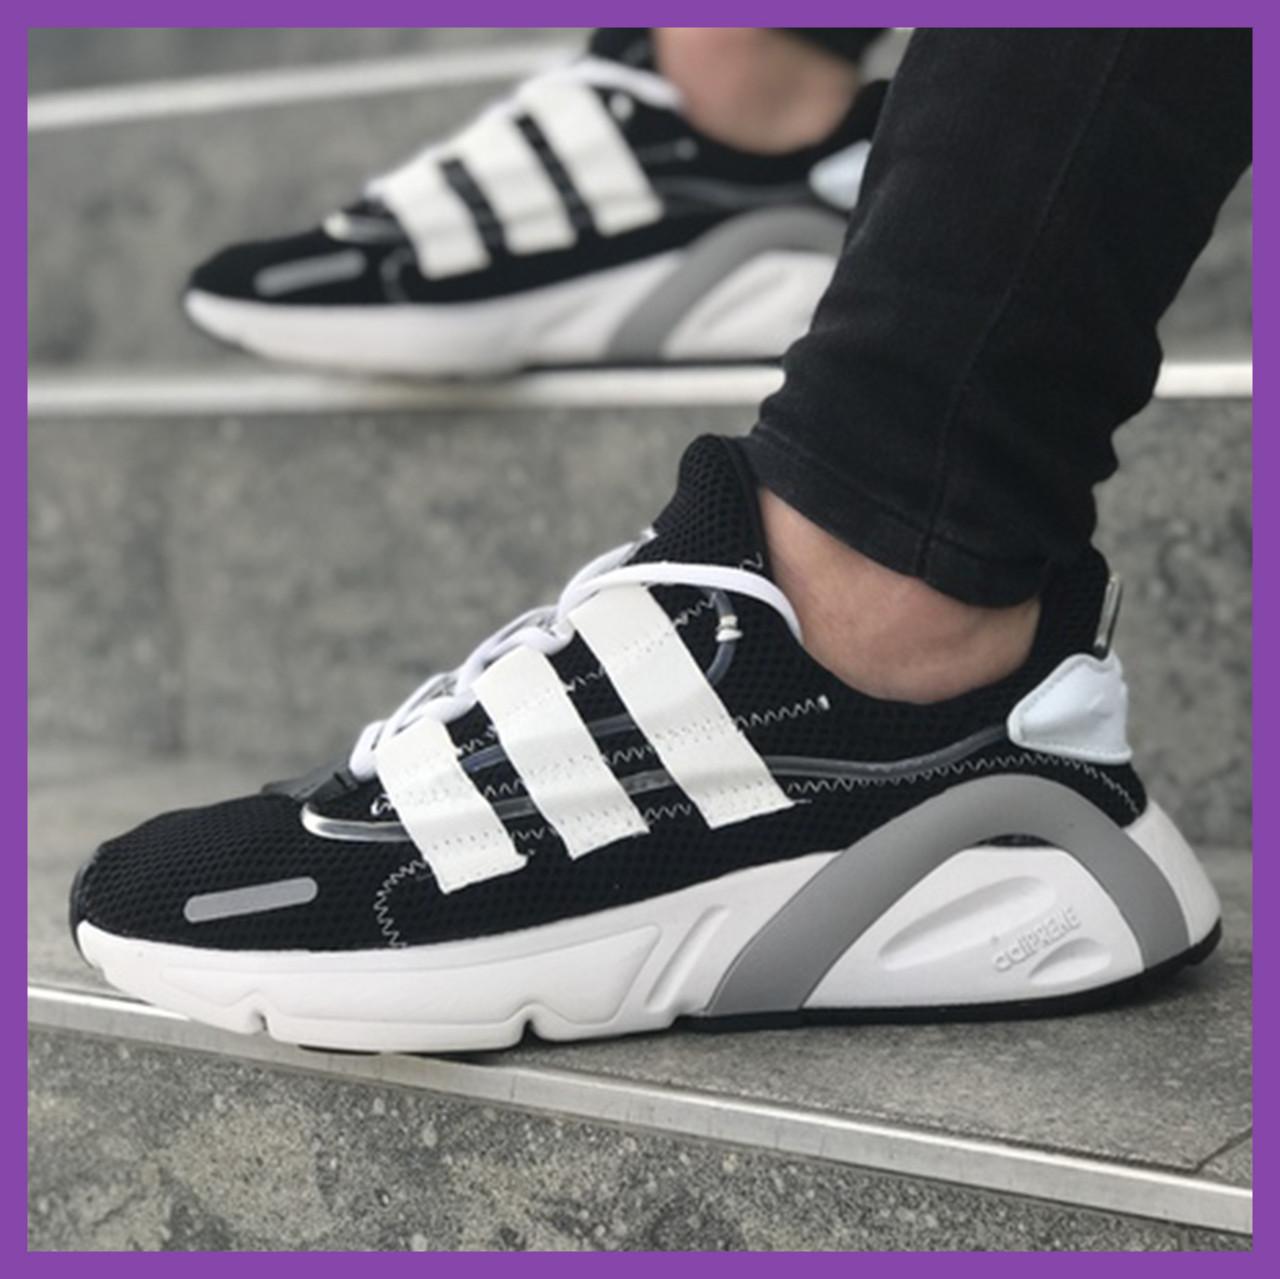 Adidas Yeezy Boost 600 \